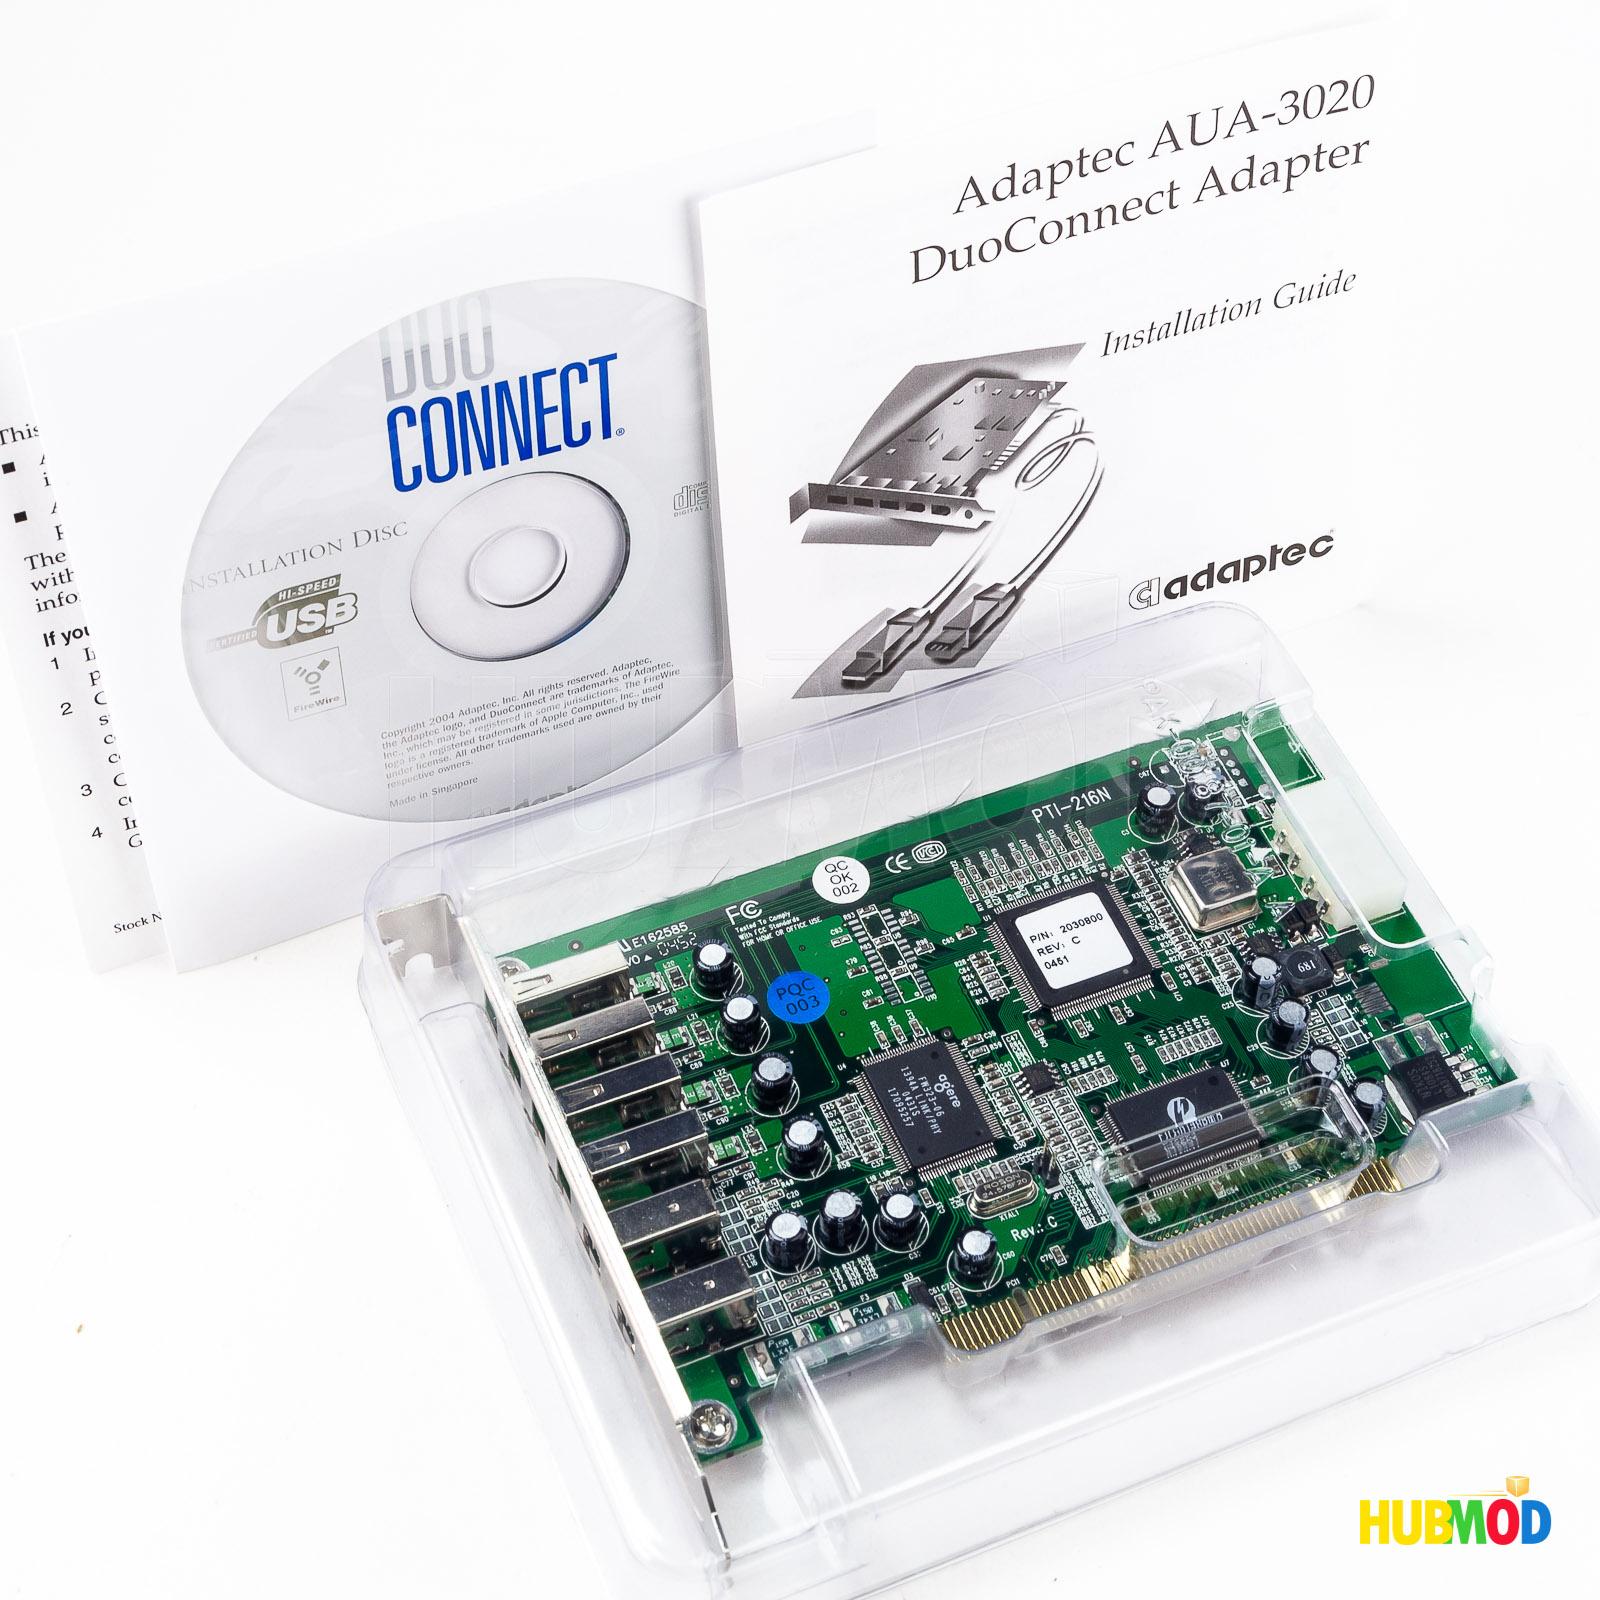 Adaptec AUA-2000B USB2 Connect Adapter *NEW*